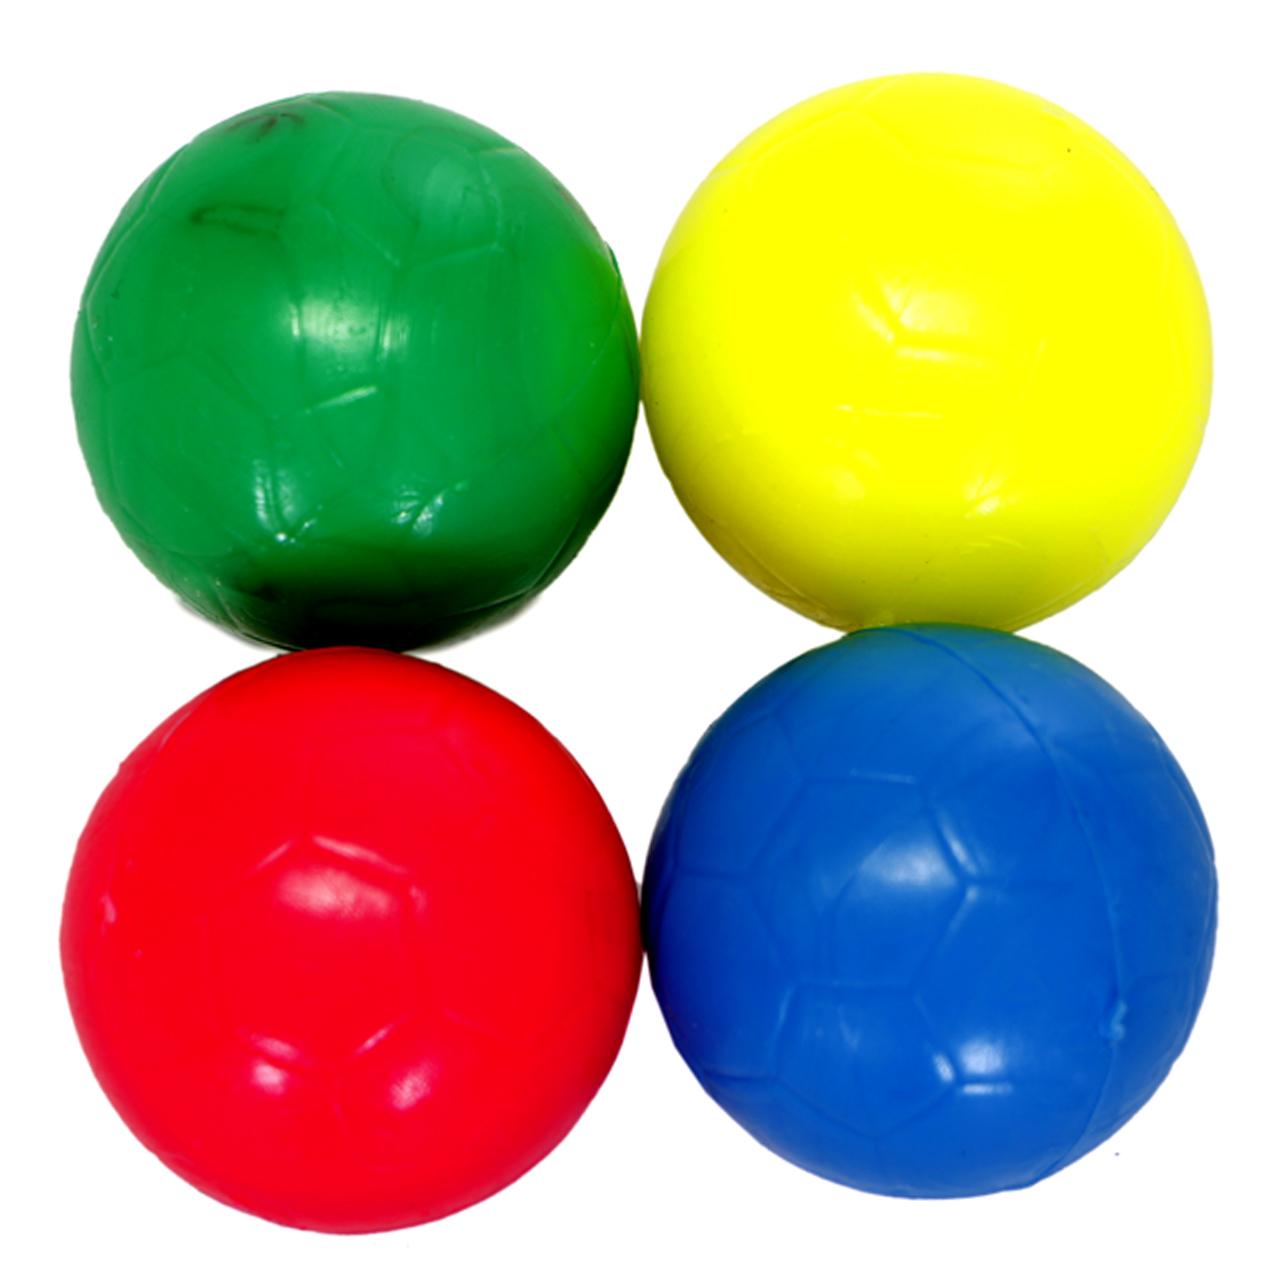 توپ فوتبال دستی بسته 4 عددی سایز 4 thumb